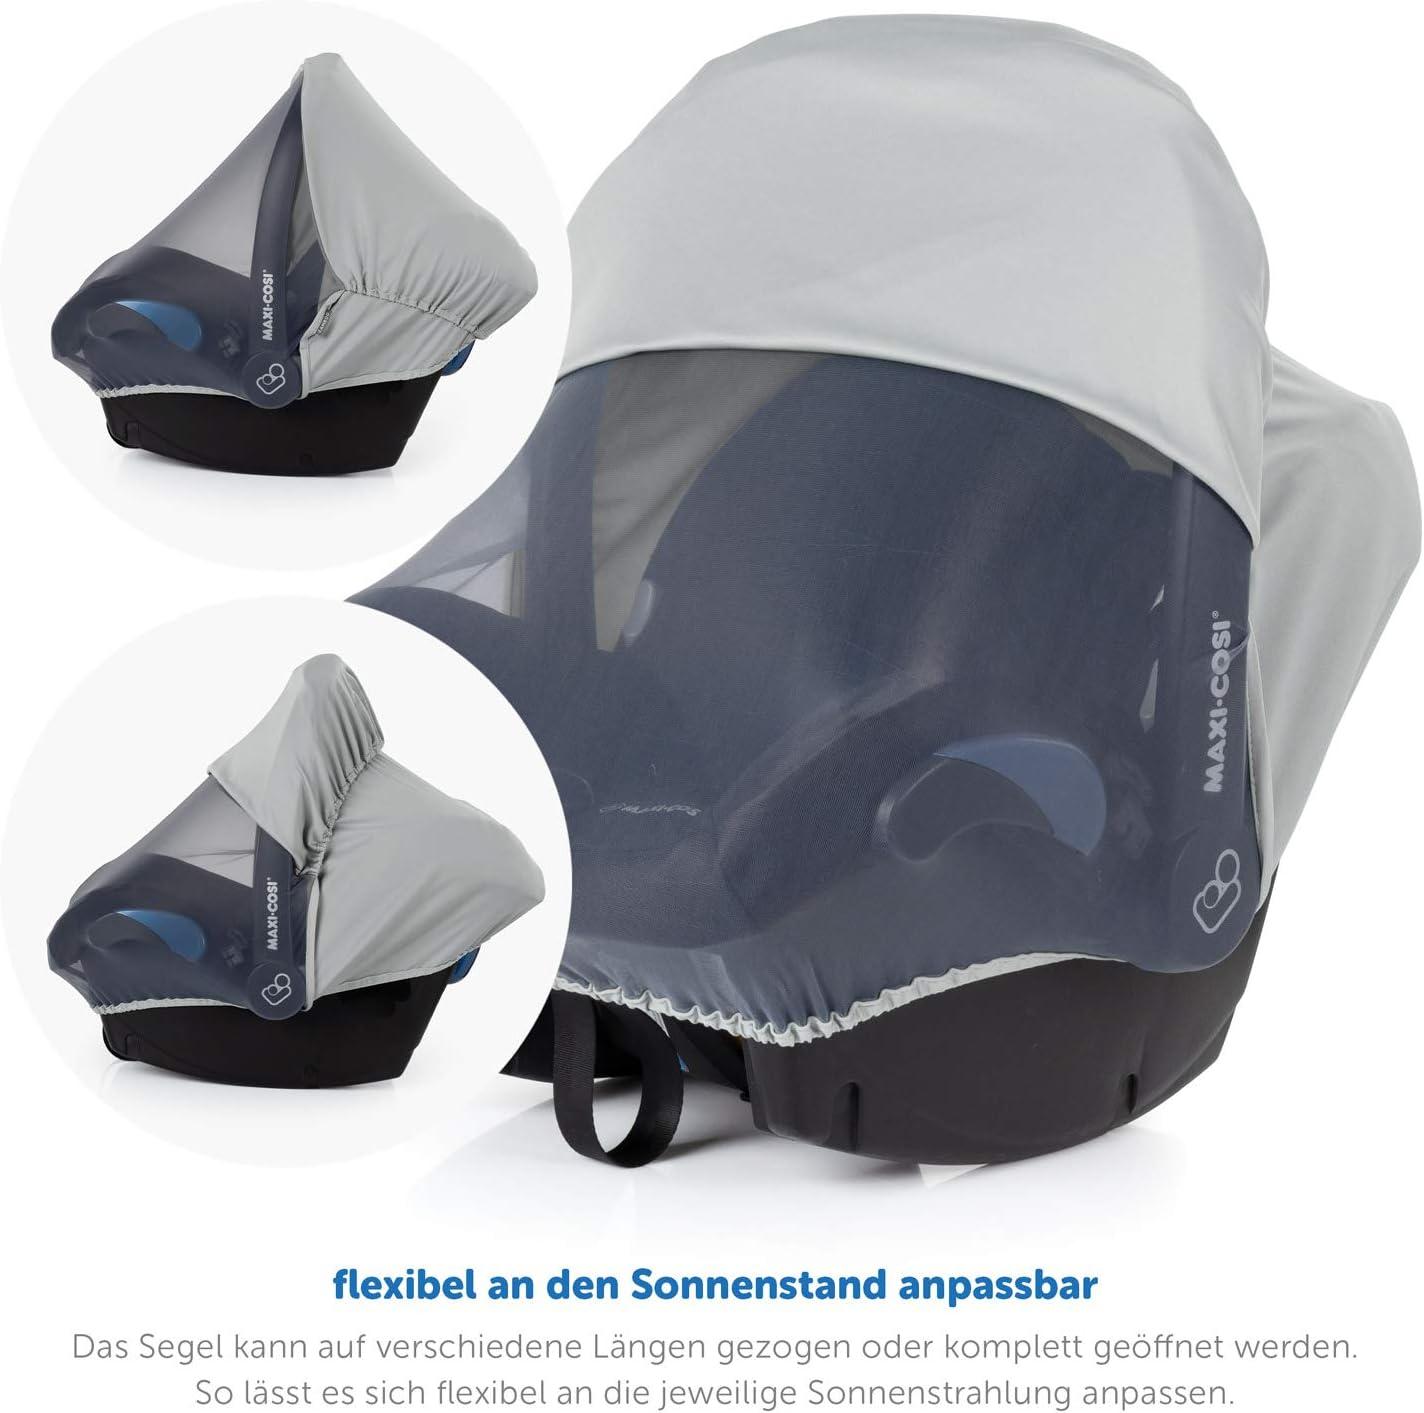 | Toldo solar con Protecci/ón UV gris Zamboo Cubierta 3 en 1 para Grupo 0+ se adapta a Maxi-Cosi//Cybex//R/ömer Mosquitera y Funda de asiento